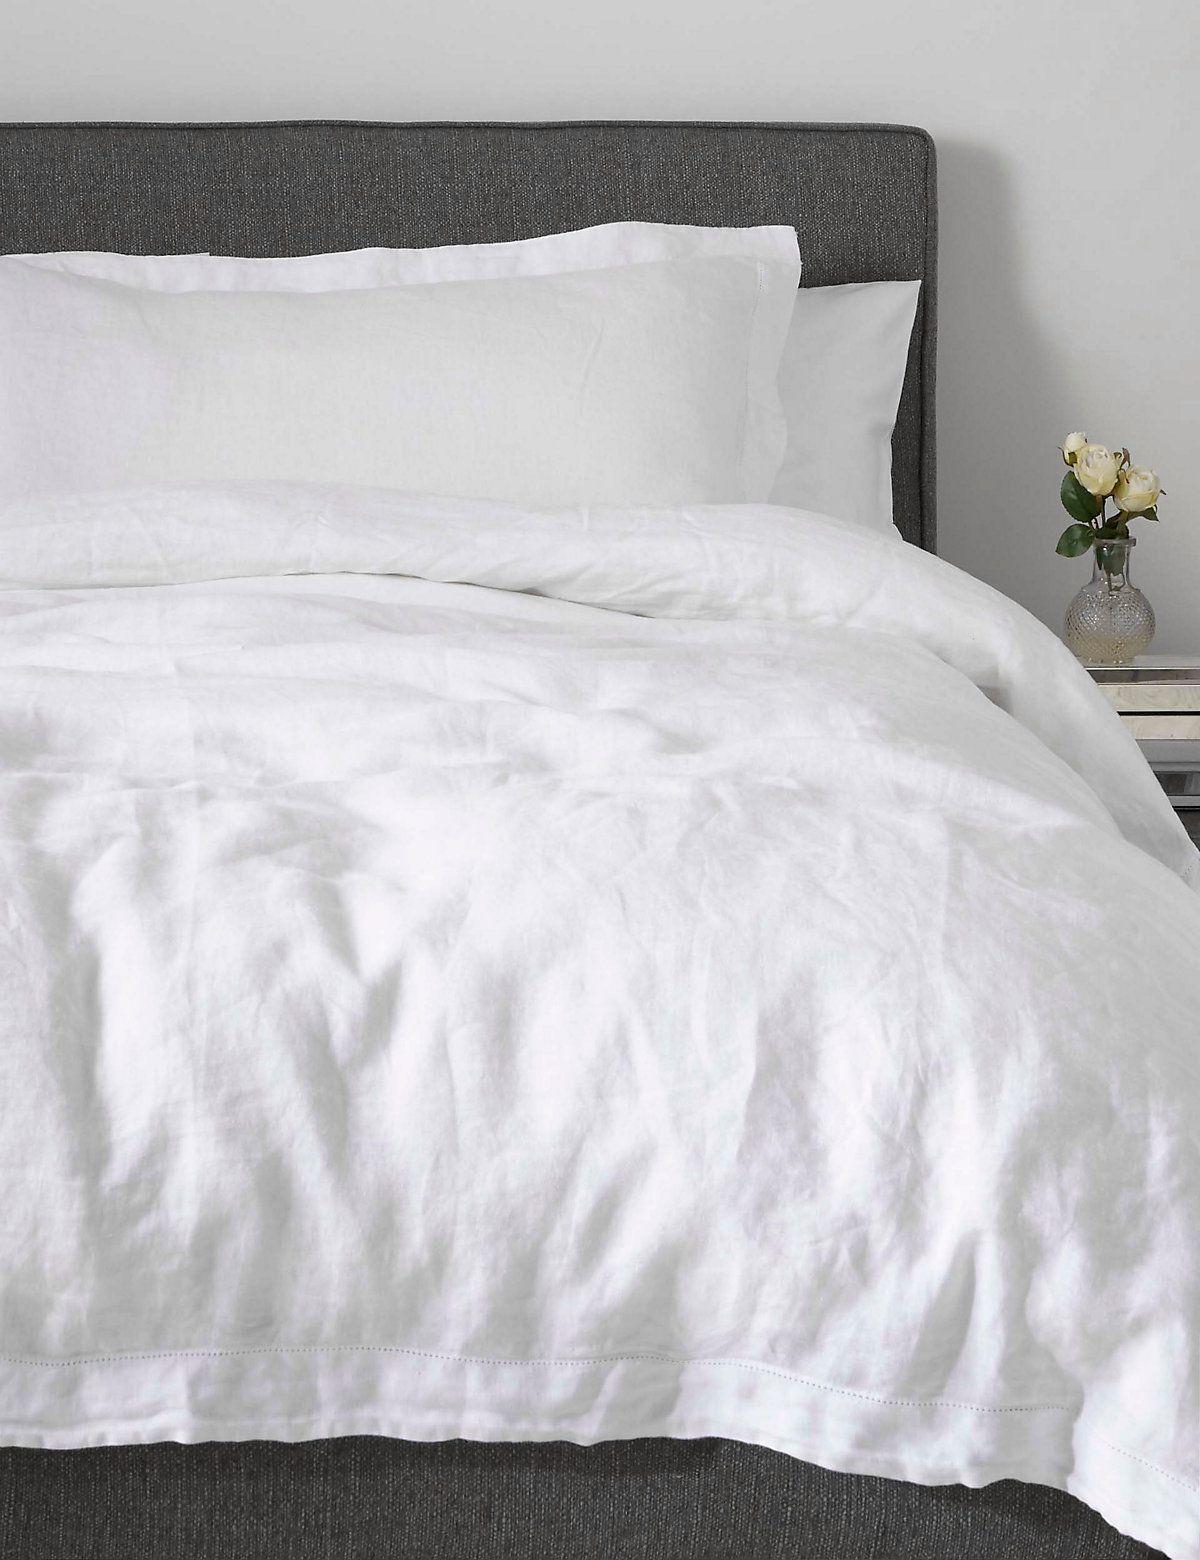 Pure Linen Bedding, Marks & Spencer